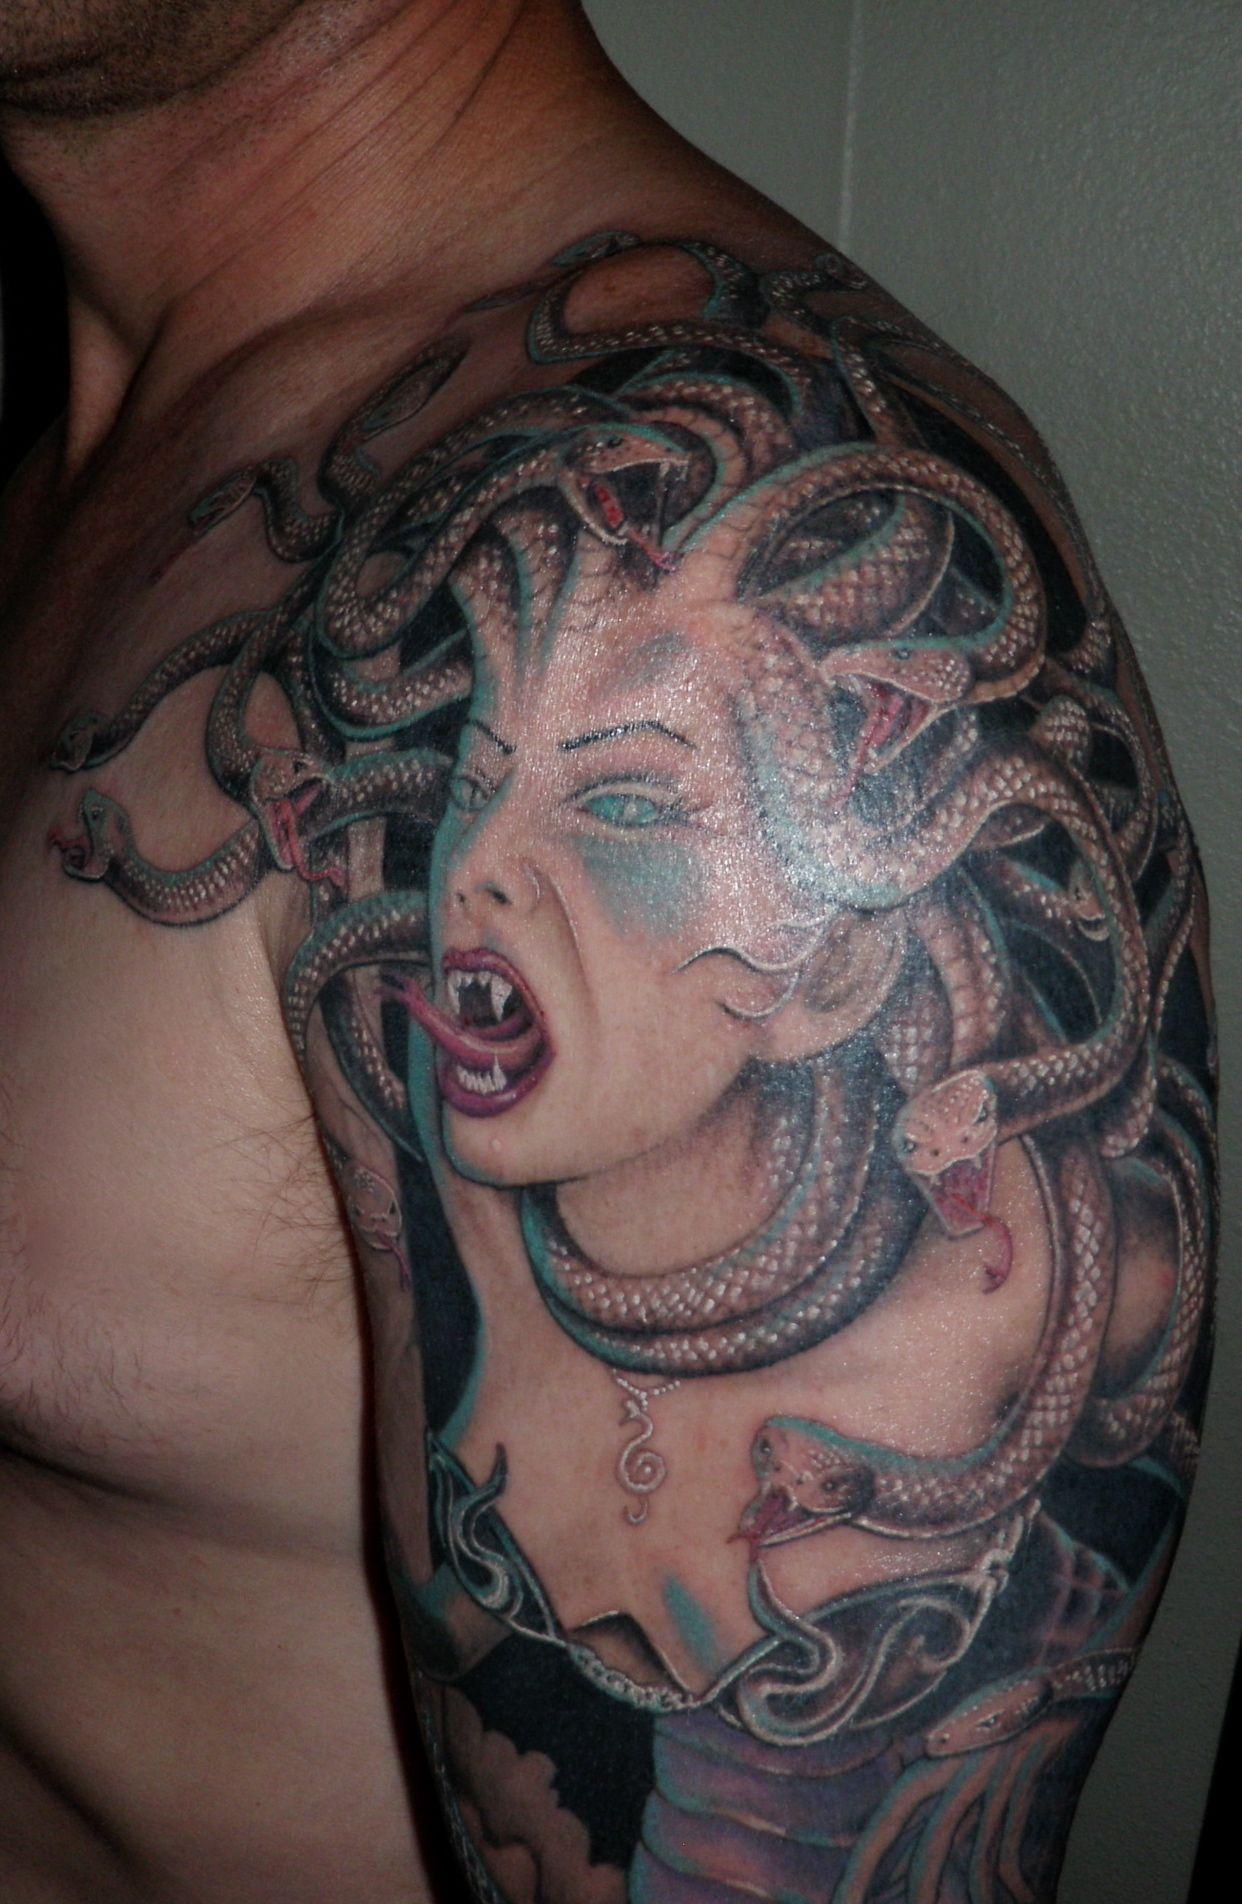 Medusa Artwork Tattoo: Hubby's Tattoos